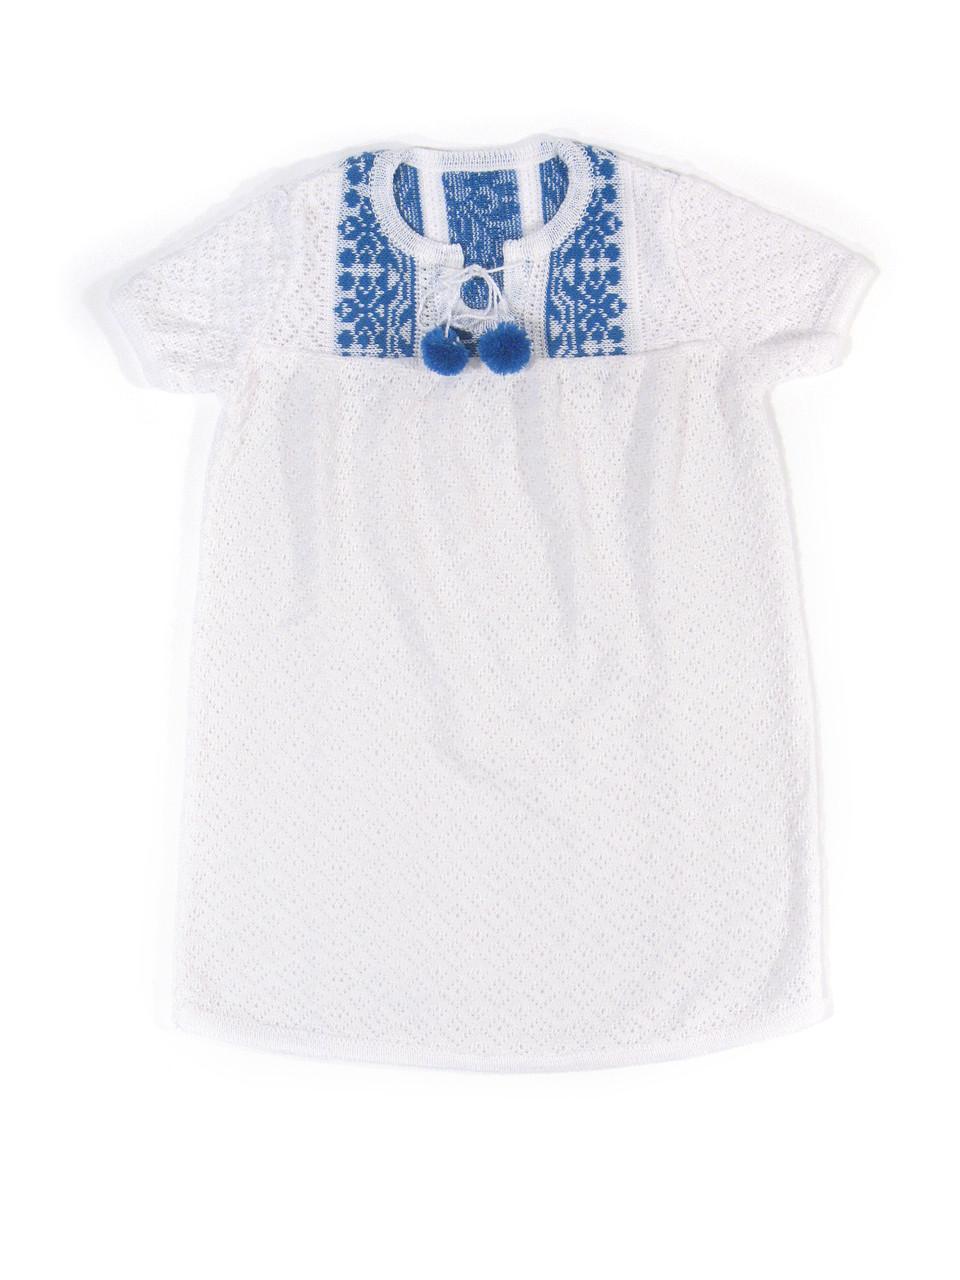 Платье для девочки 0822 (х/б)